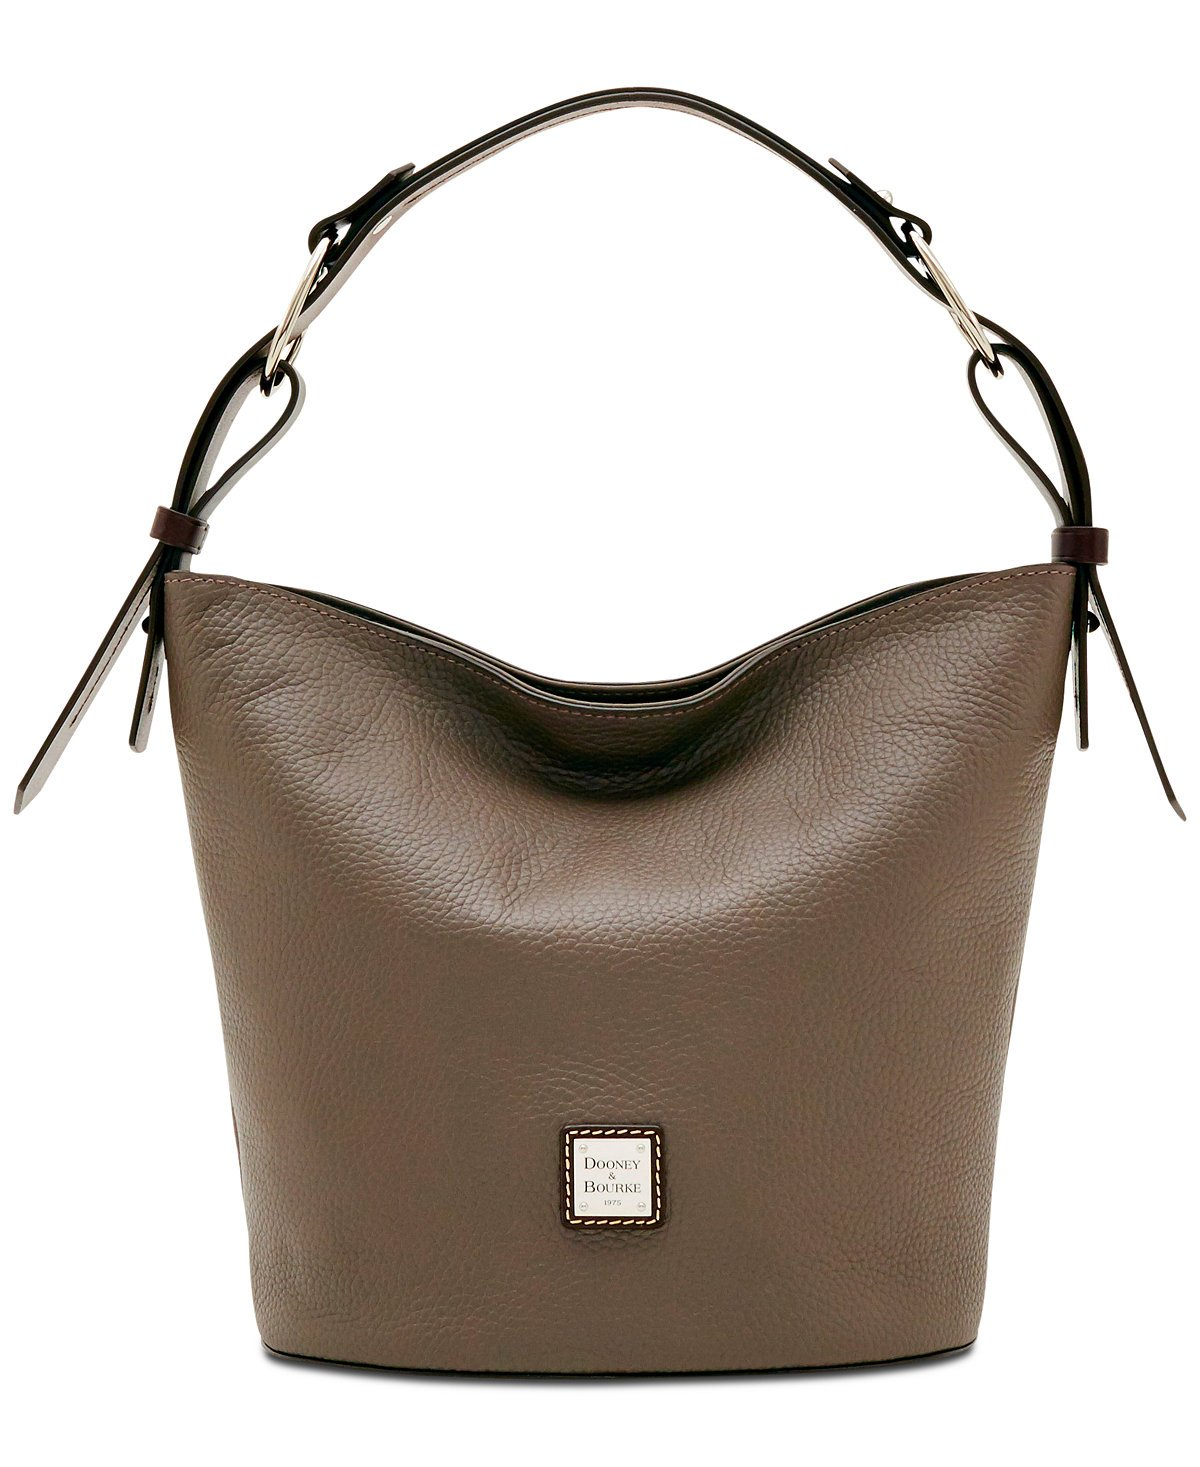 Dooney & Bourke Henley Small Leather Feedbag (Taupe)